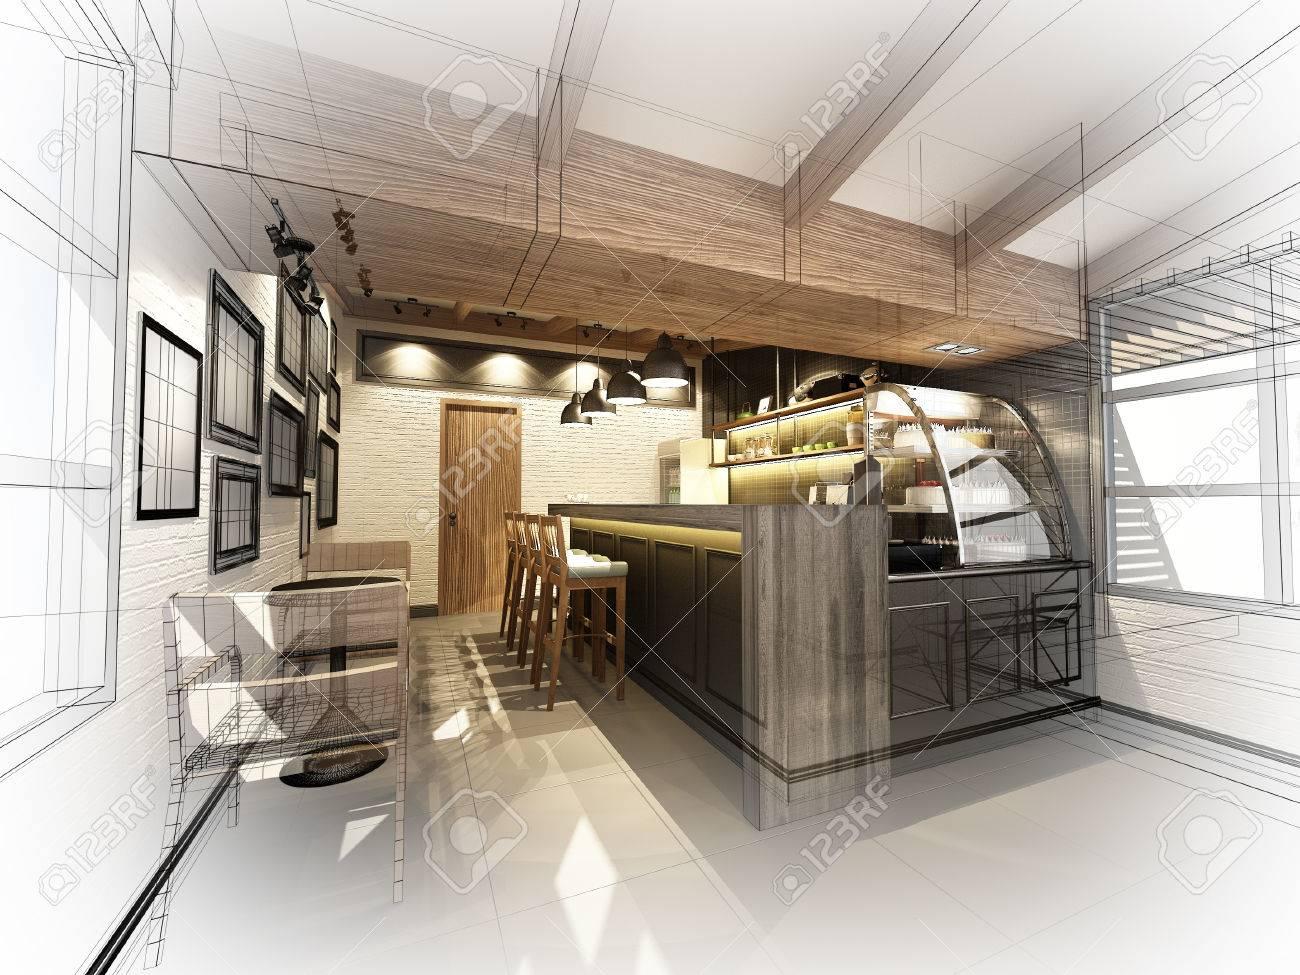 sketch design of coffee shop ,3dwire frame render - 43835173